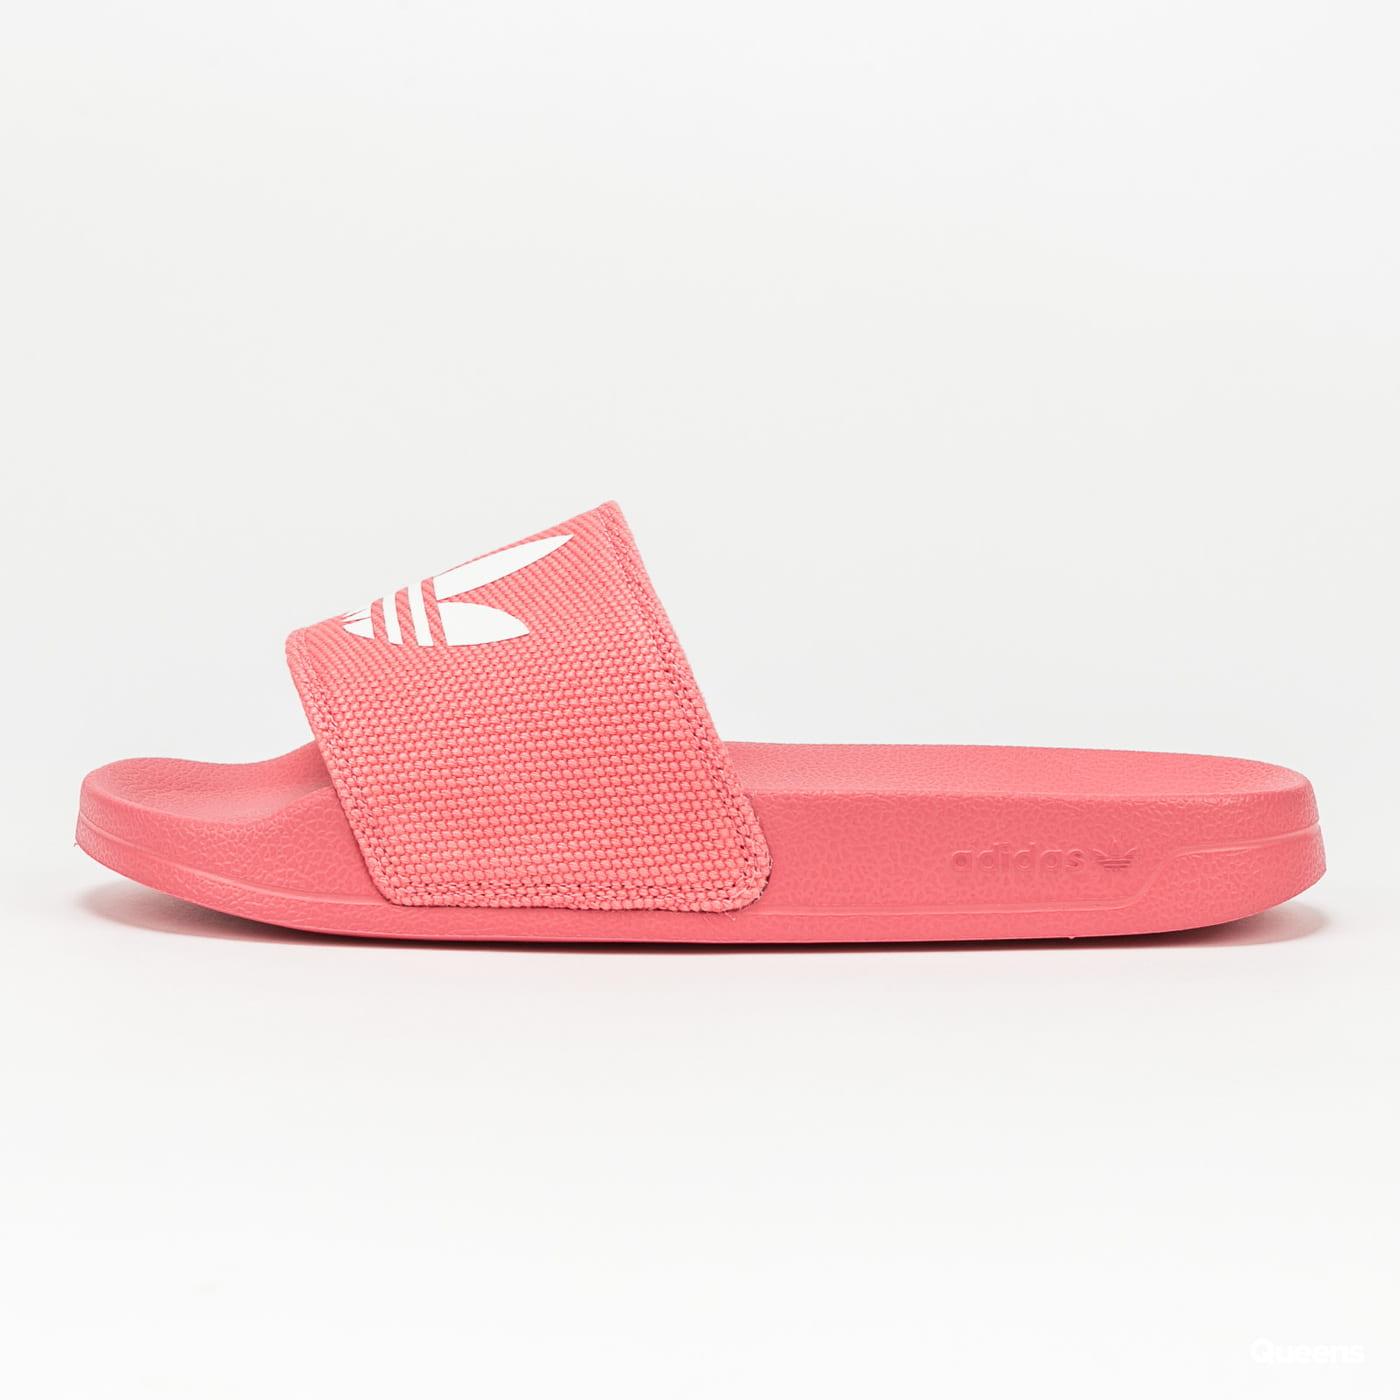 adidas Originals Adilette Lite W hazros / ftwwht / hazros